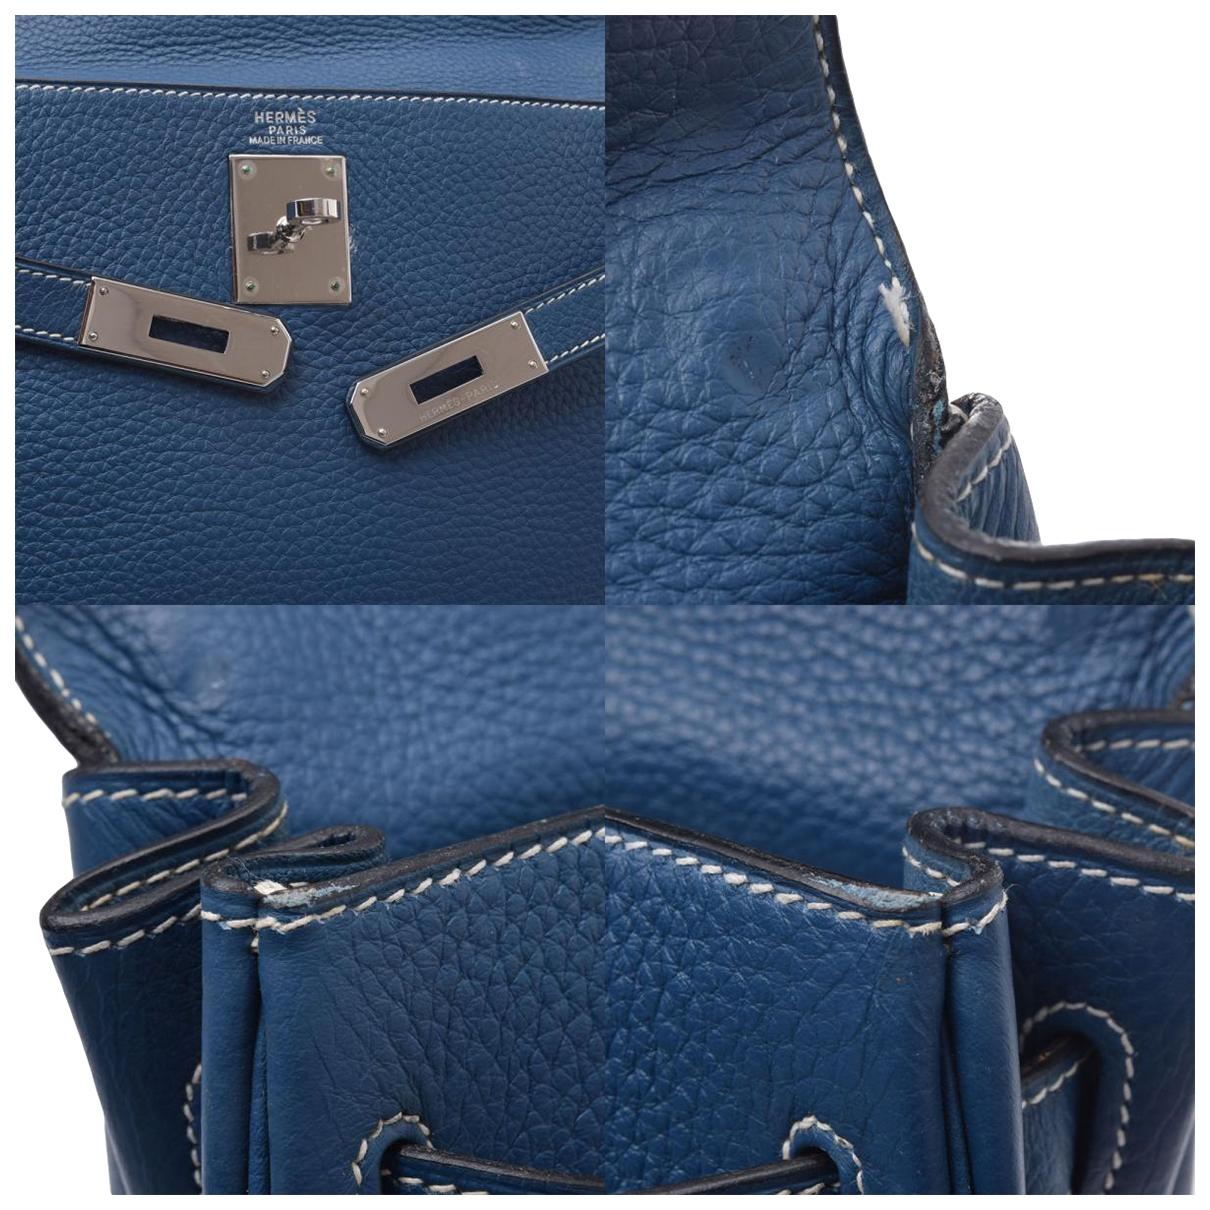 Hermes - Sac a main Kelly 32 pour femme en cuir - bleu